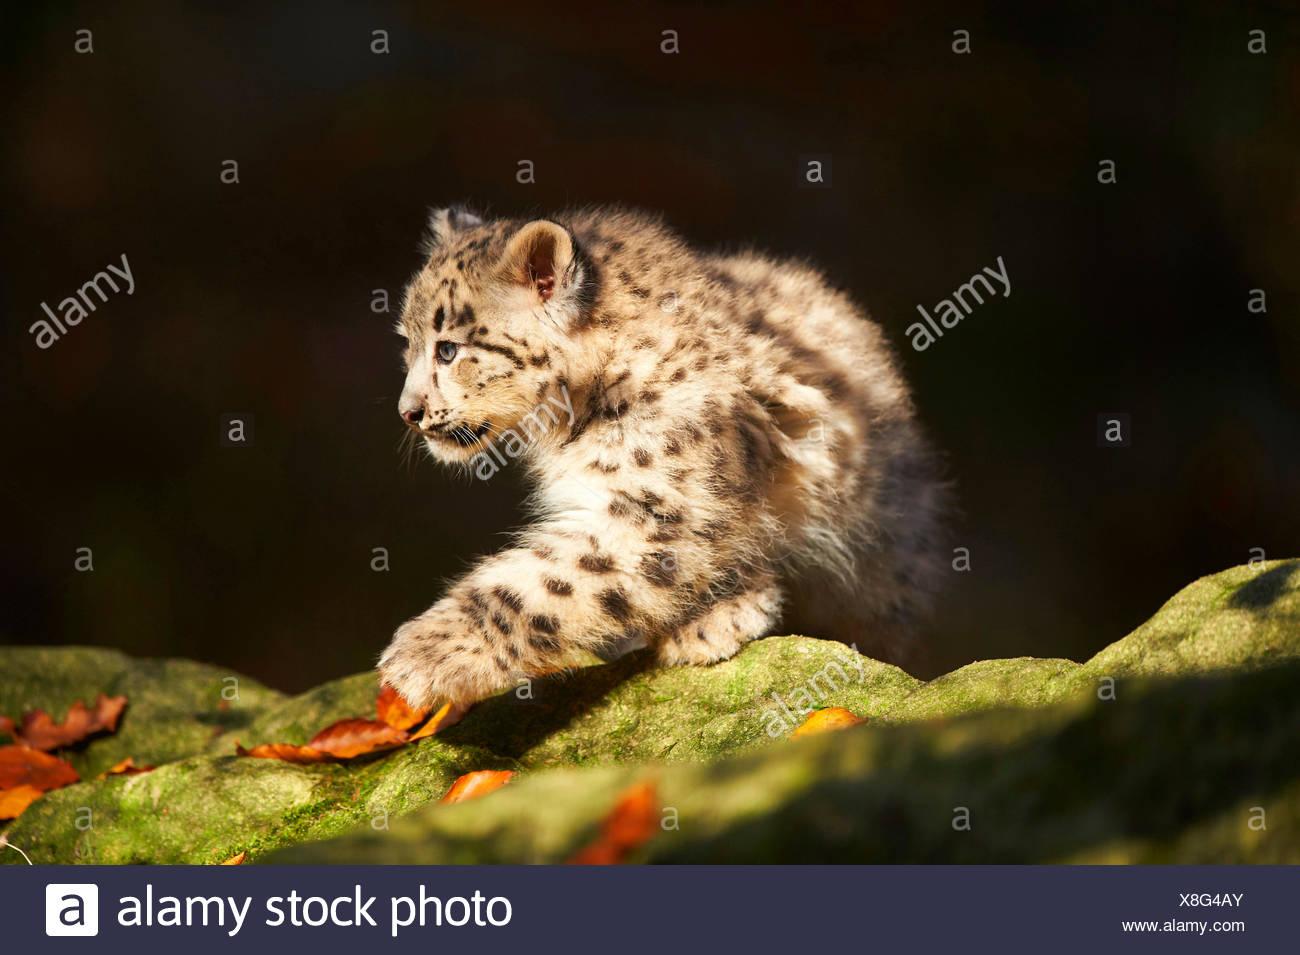 snow leopard (Uncia uncia, Panthera uncia), leopard cub on mossy stones, half-length portrait - Stock Image